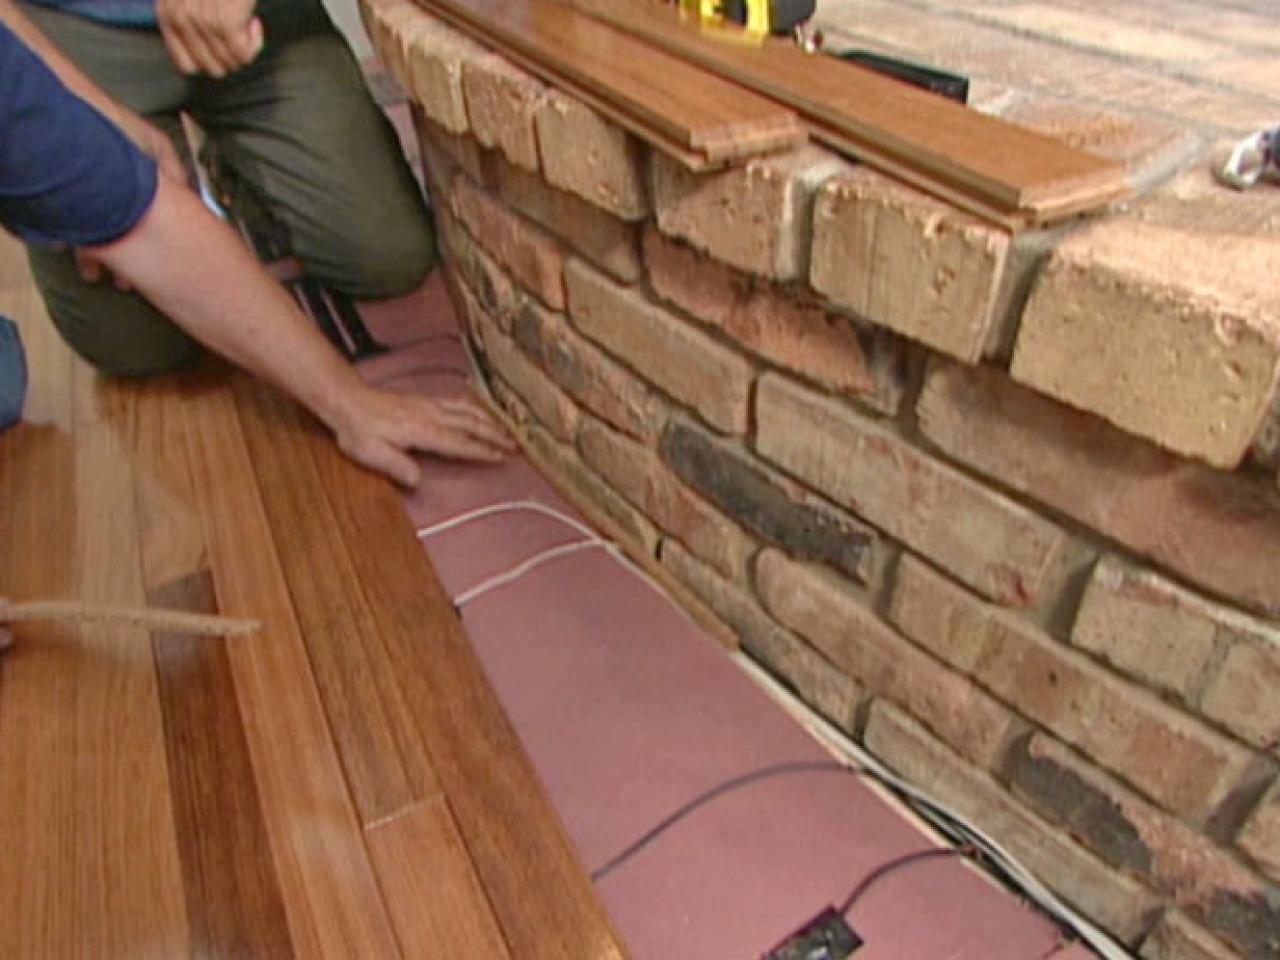 Best way to clean hardwood floors without streaking meze for Best way to clean laminate floors without leaving streaks